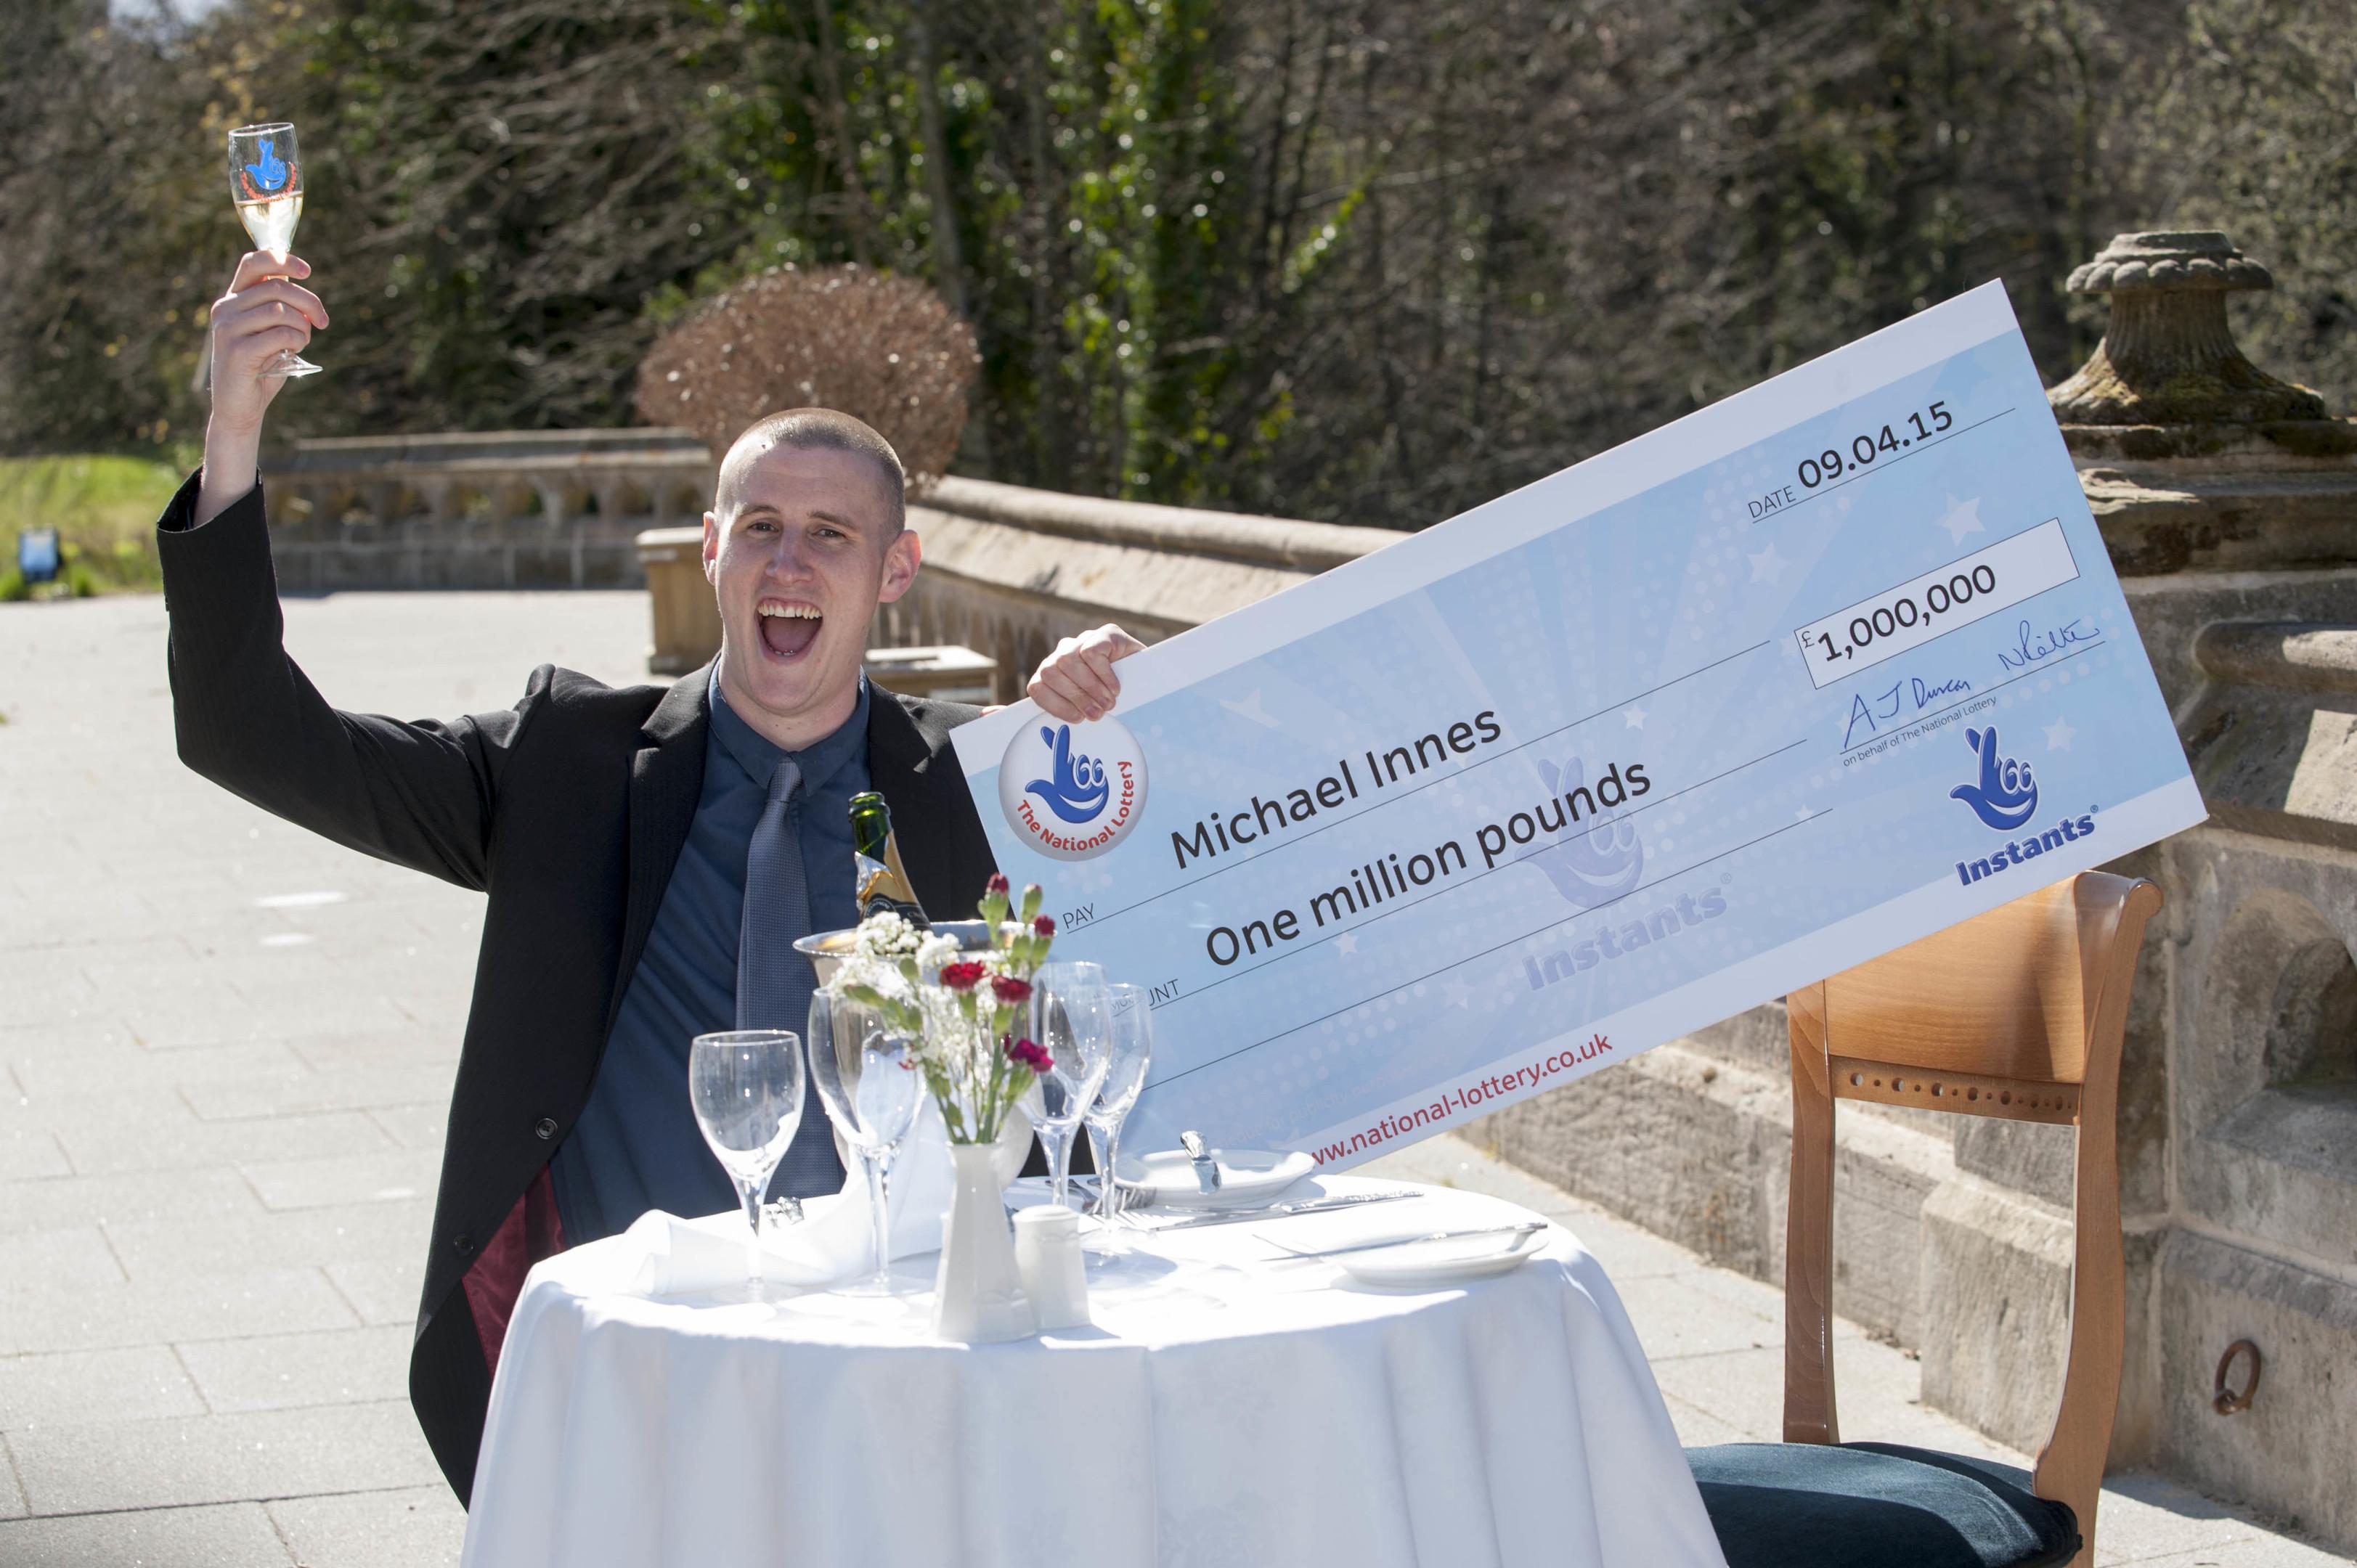 Michael Innes celebrates his big win